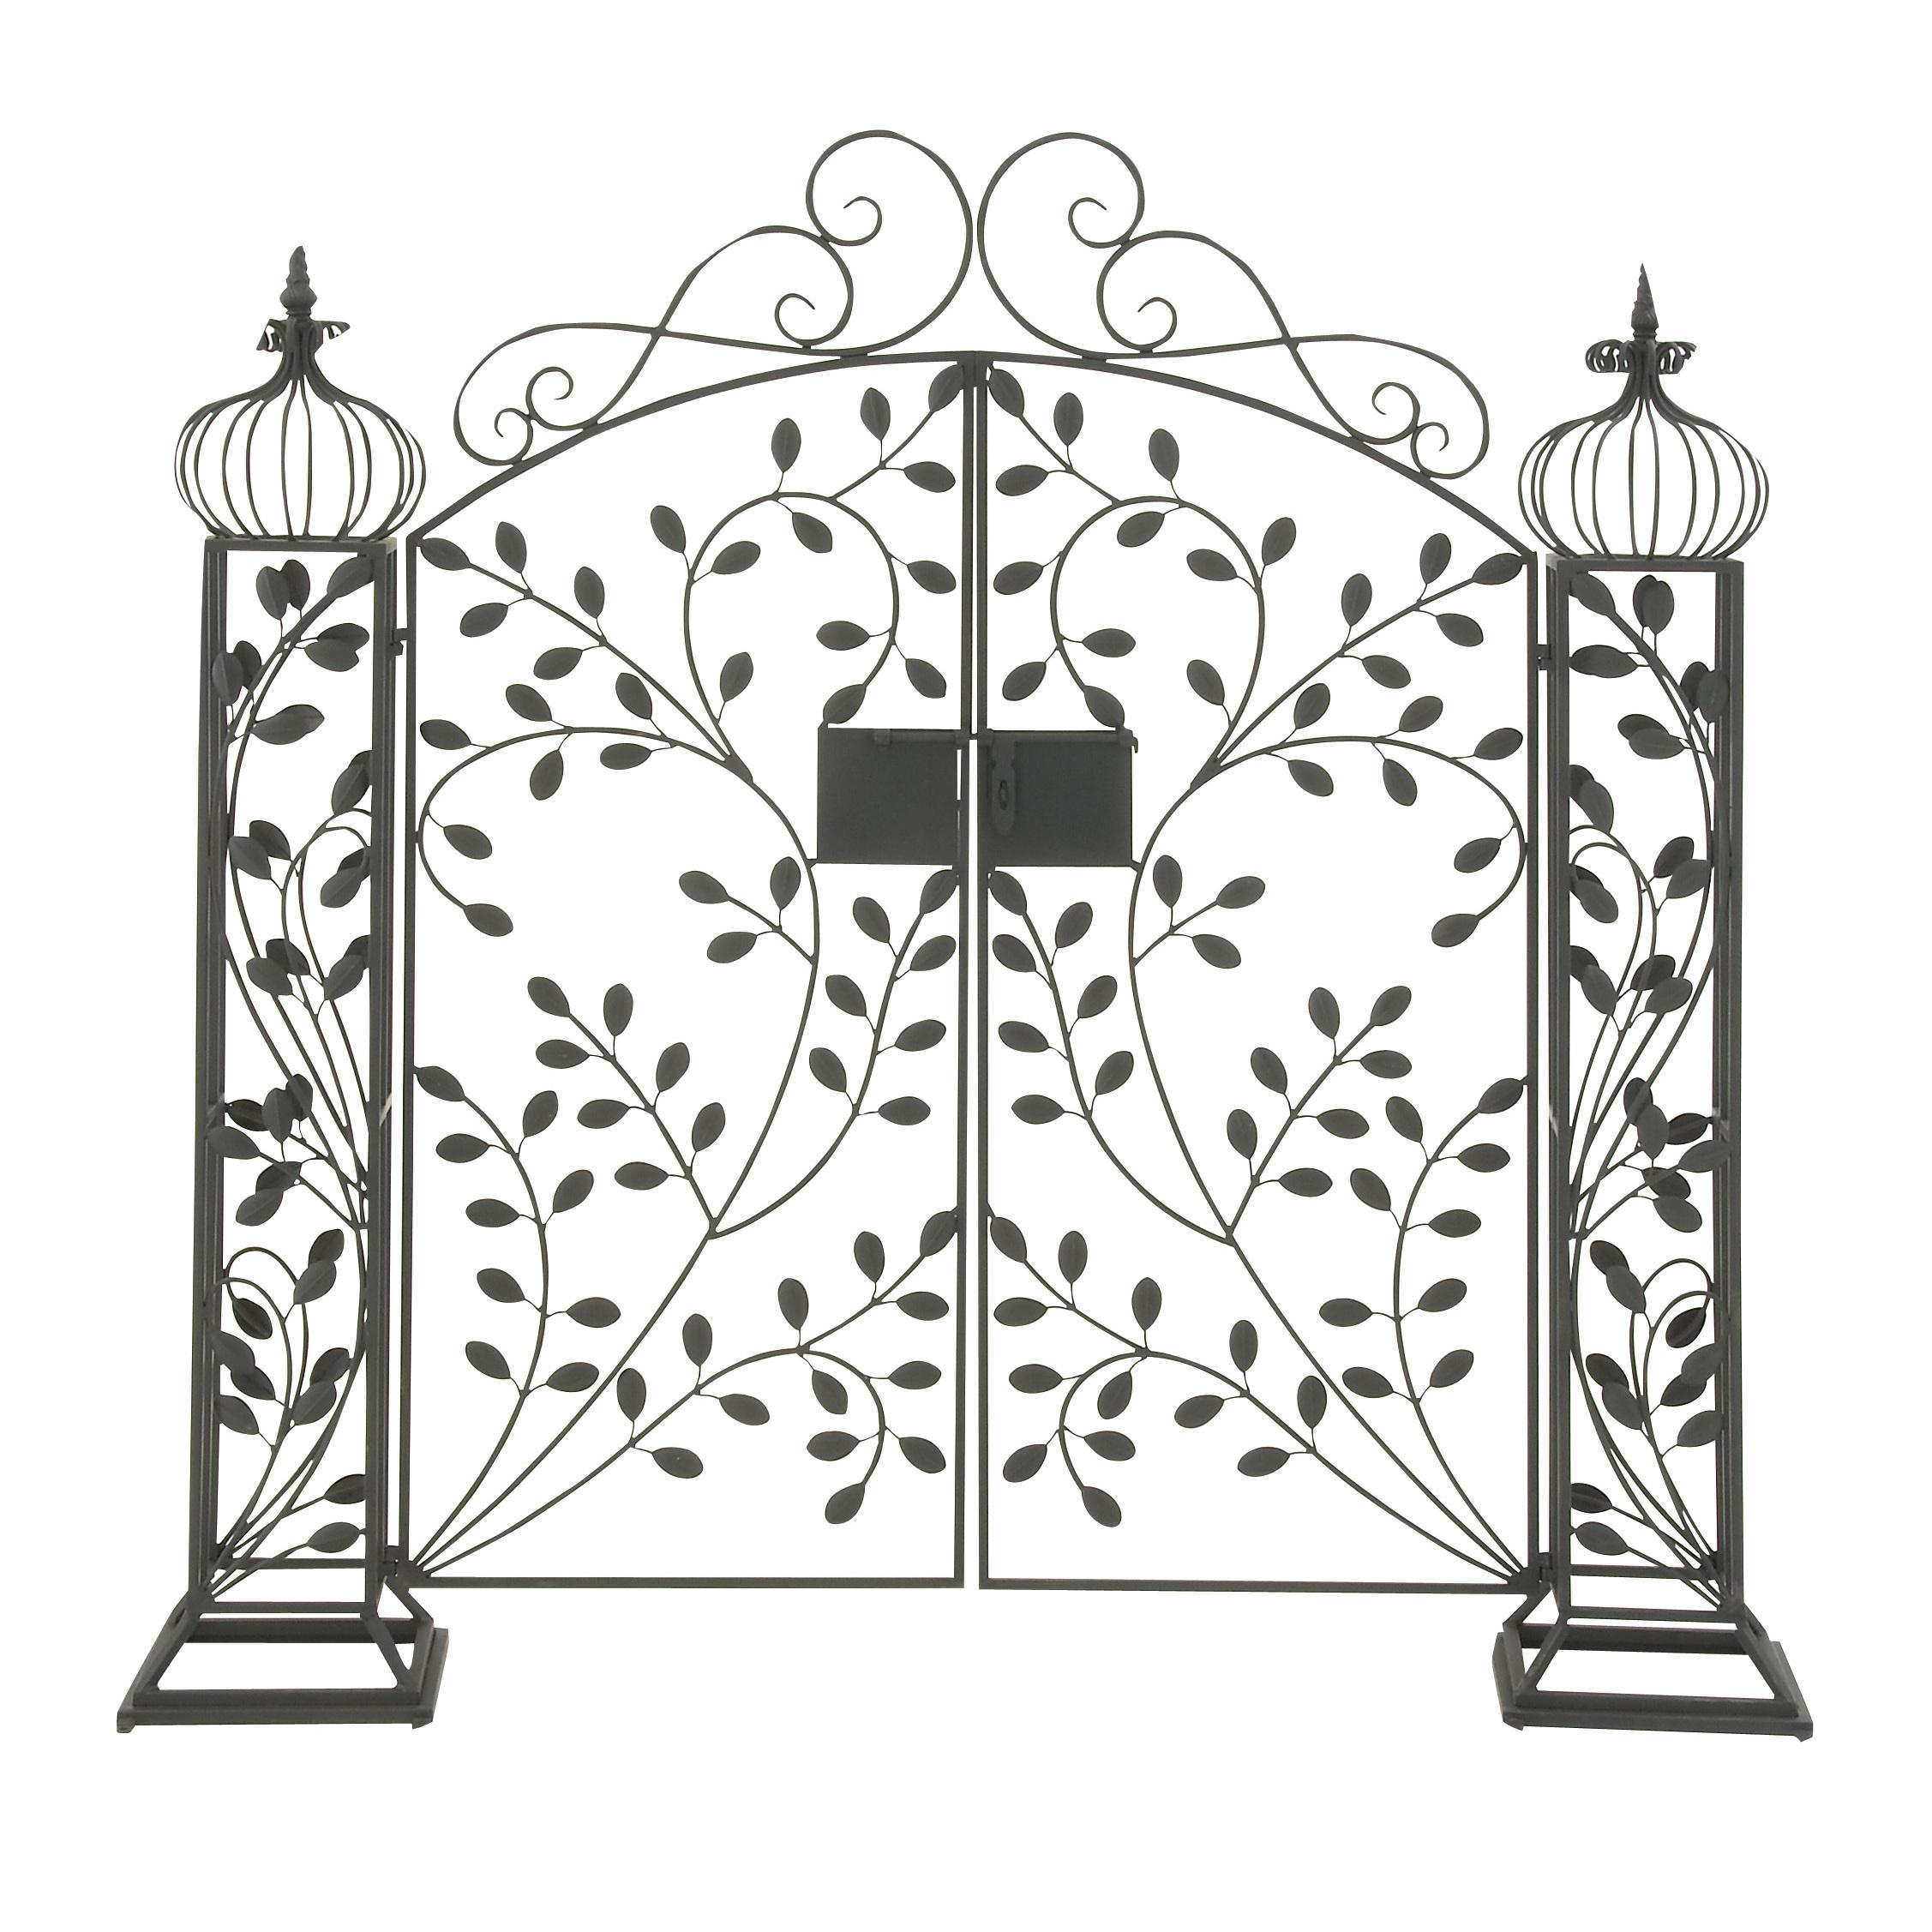 2254x2254 Captivating Metal Garden Gate